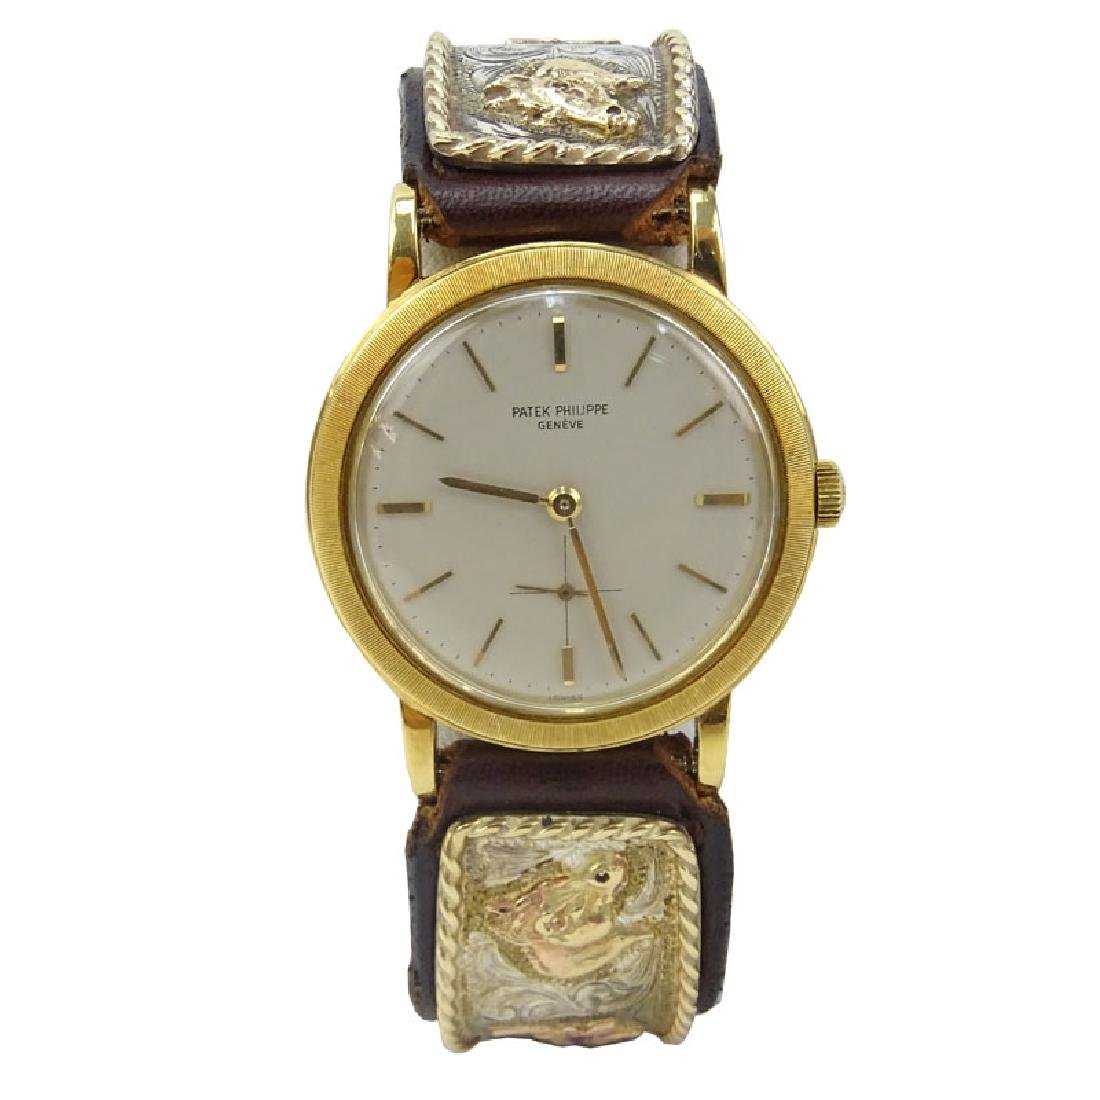 Vintage Patek Philippe 18 Karat Yellow Gold Automatic